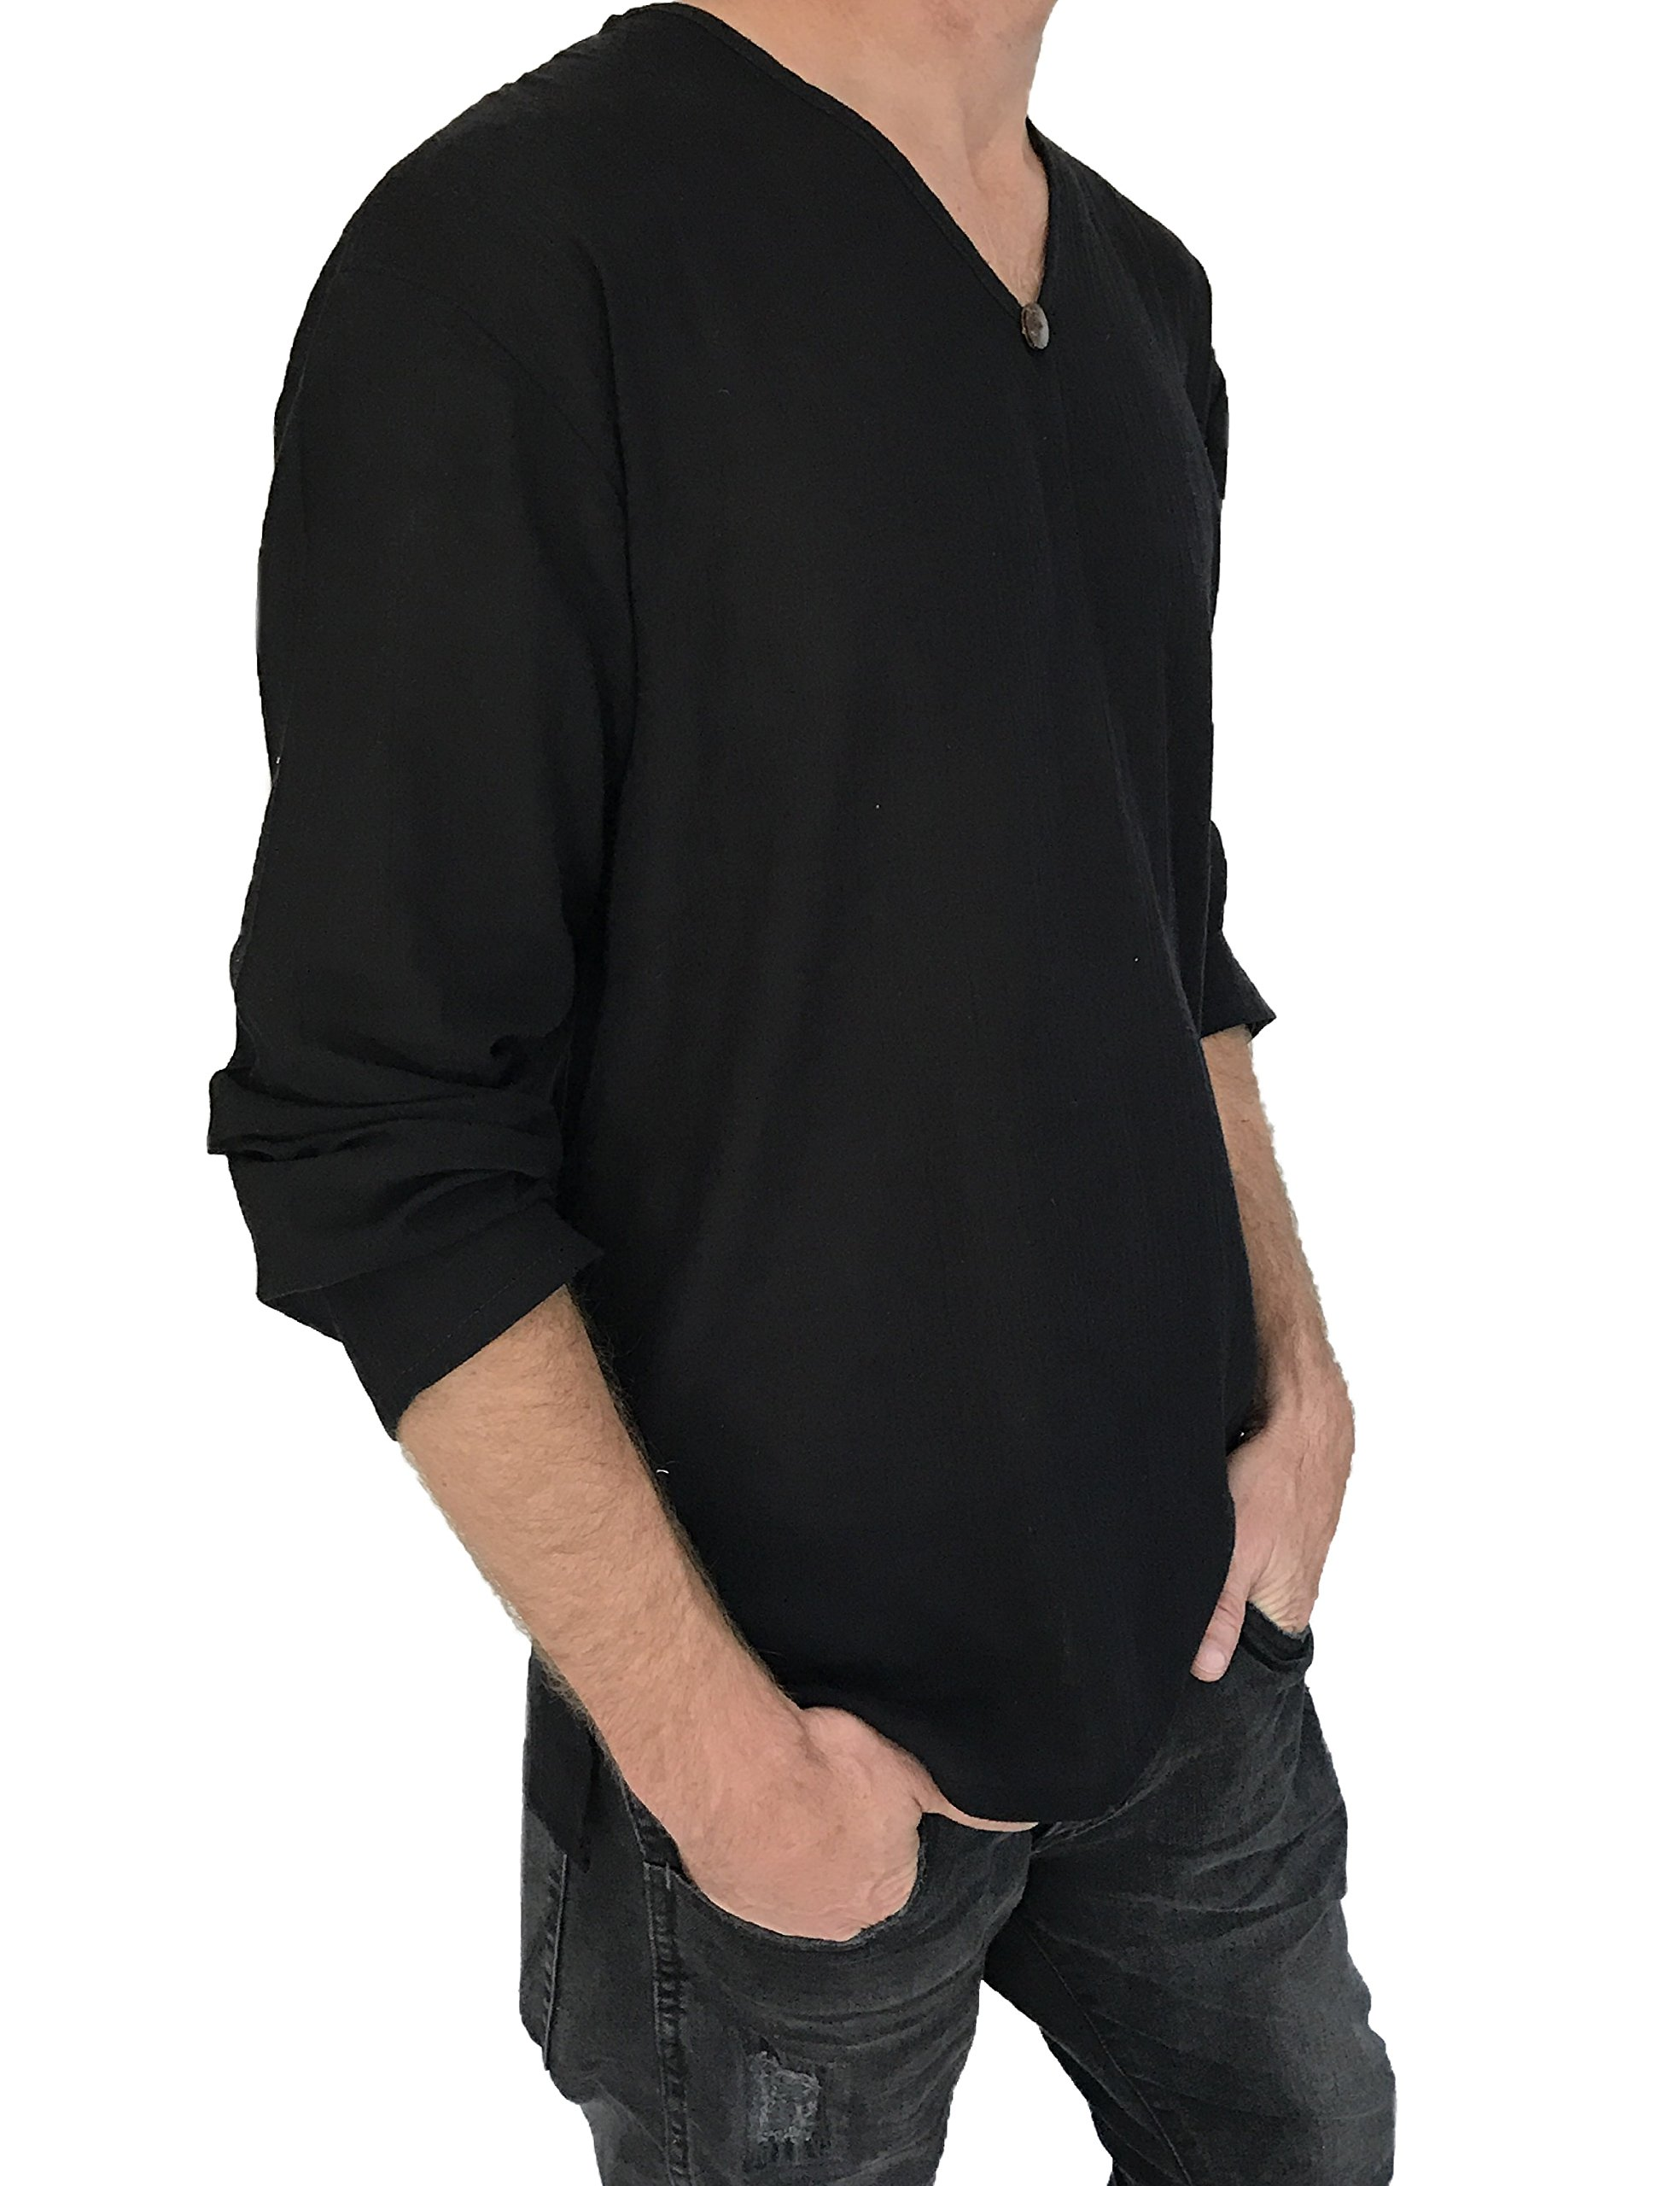 Love Quality Men's T-Shirt 100% Cotton Hippie Shirt Beach Yoga Top Feature Button (Medium, Black)